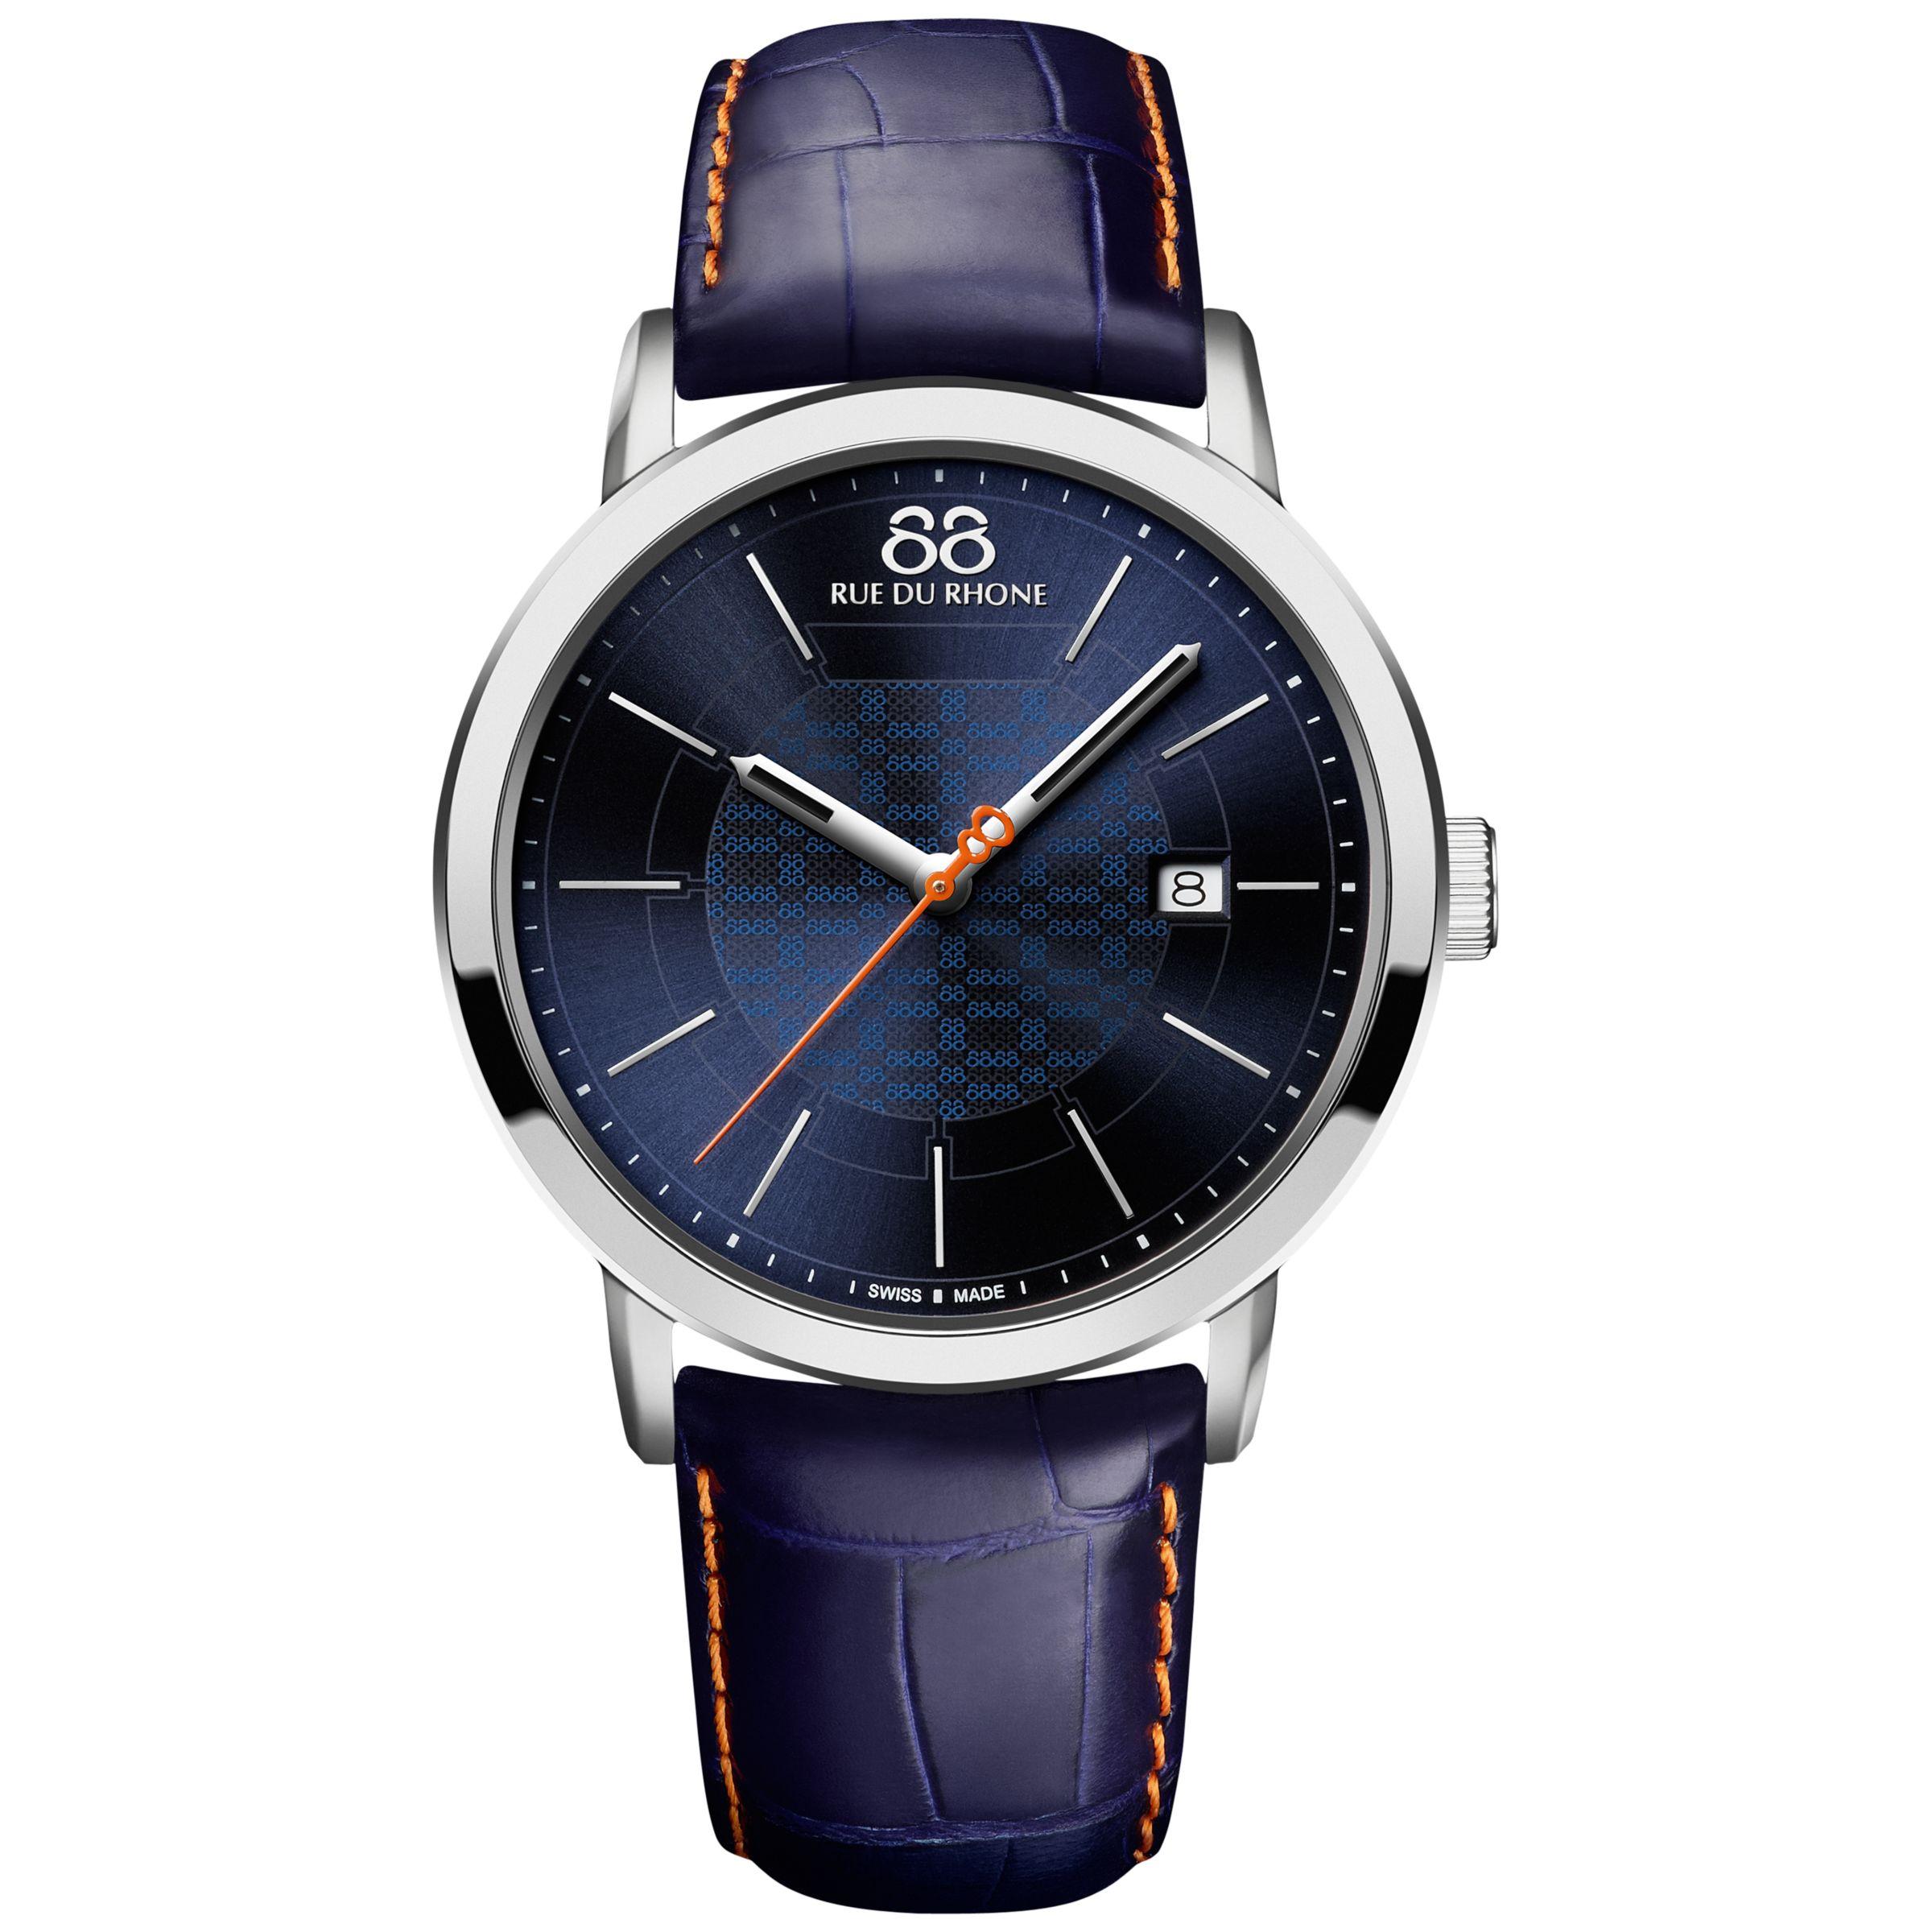 88 Rue Du Rhone 88 Rue Du Rhone Men's Double 8 Origin Leather Strap Watch